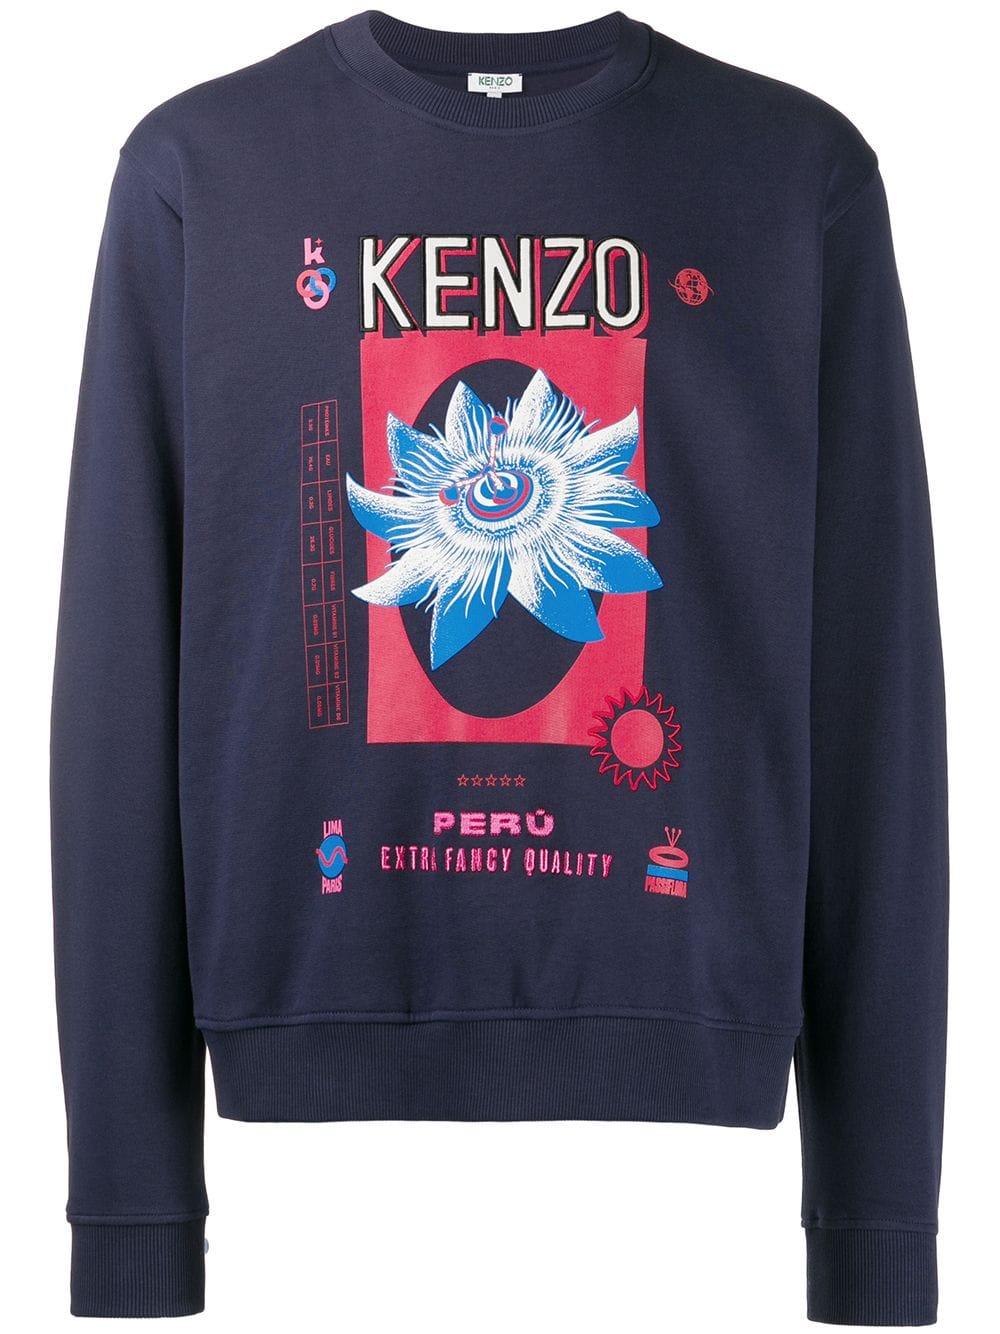 Kenzo Knits Logo Print Sweatshirt Printed Sweatshirts Sweatshirts Fashion Typography [ 1334 x 1000 Pixel ]